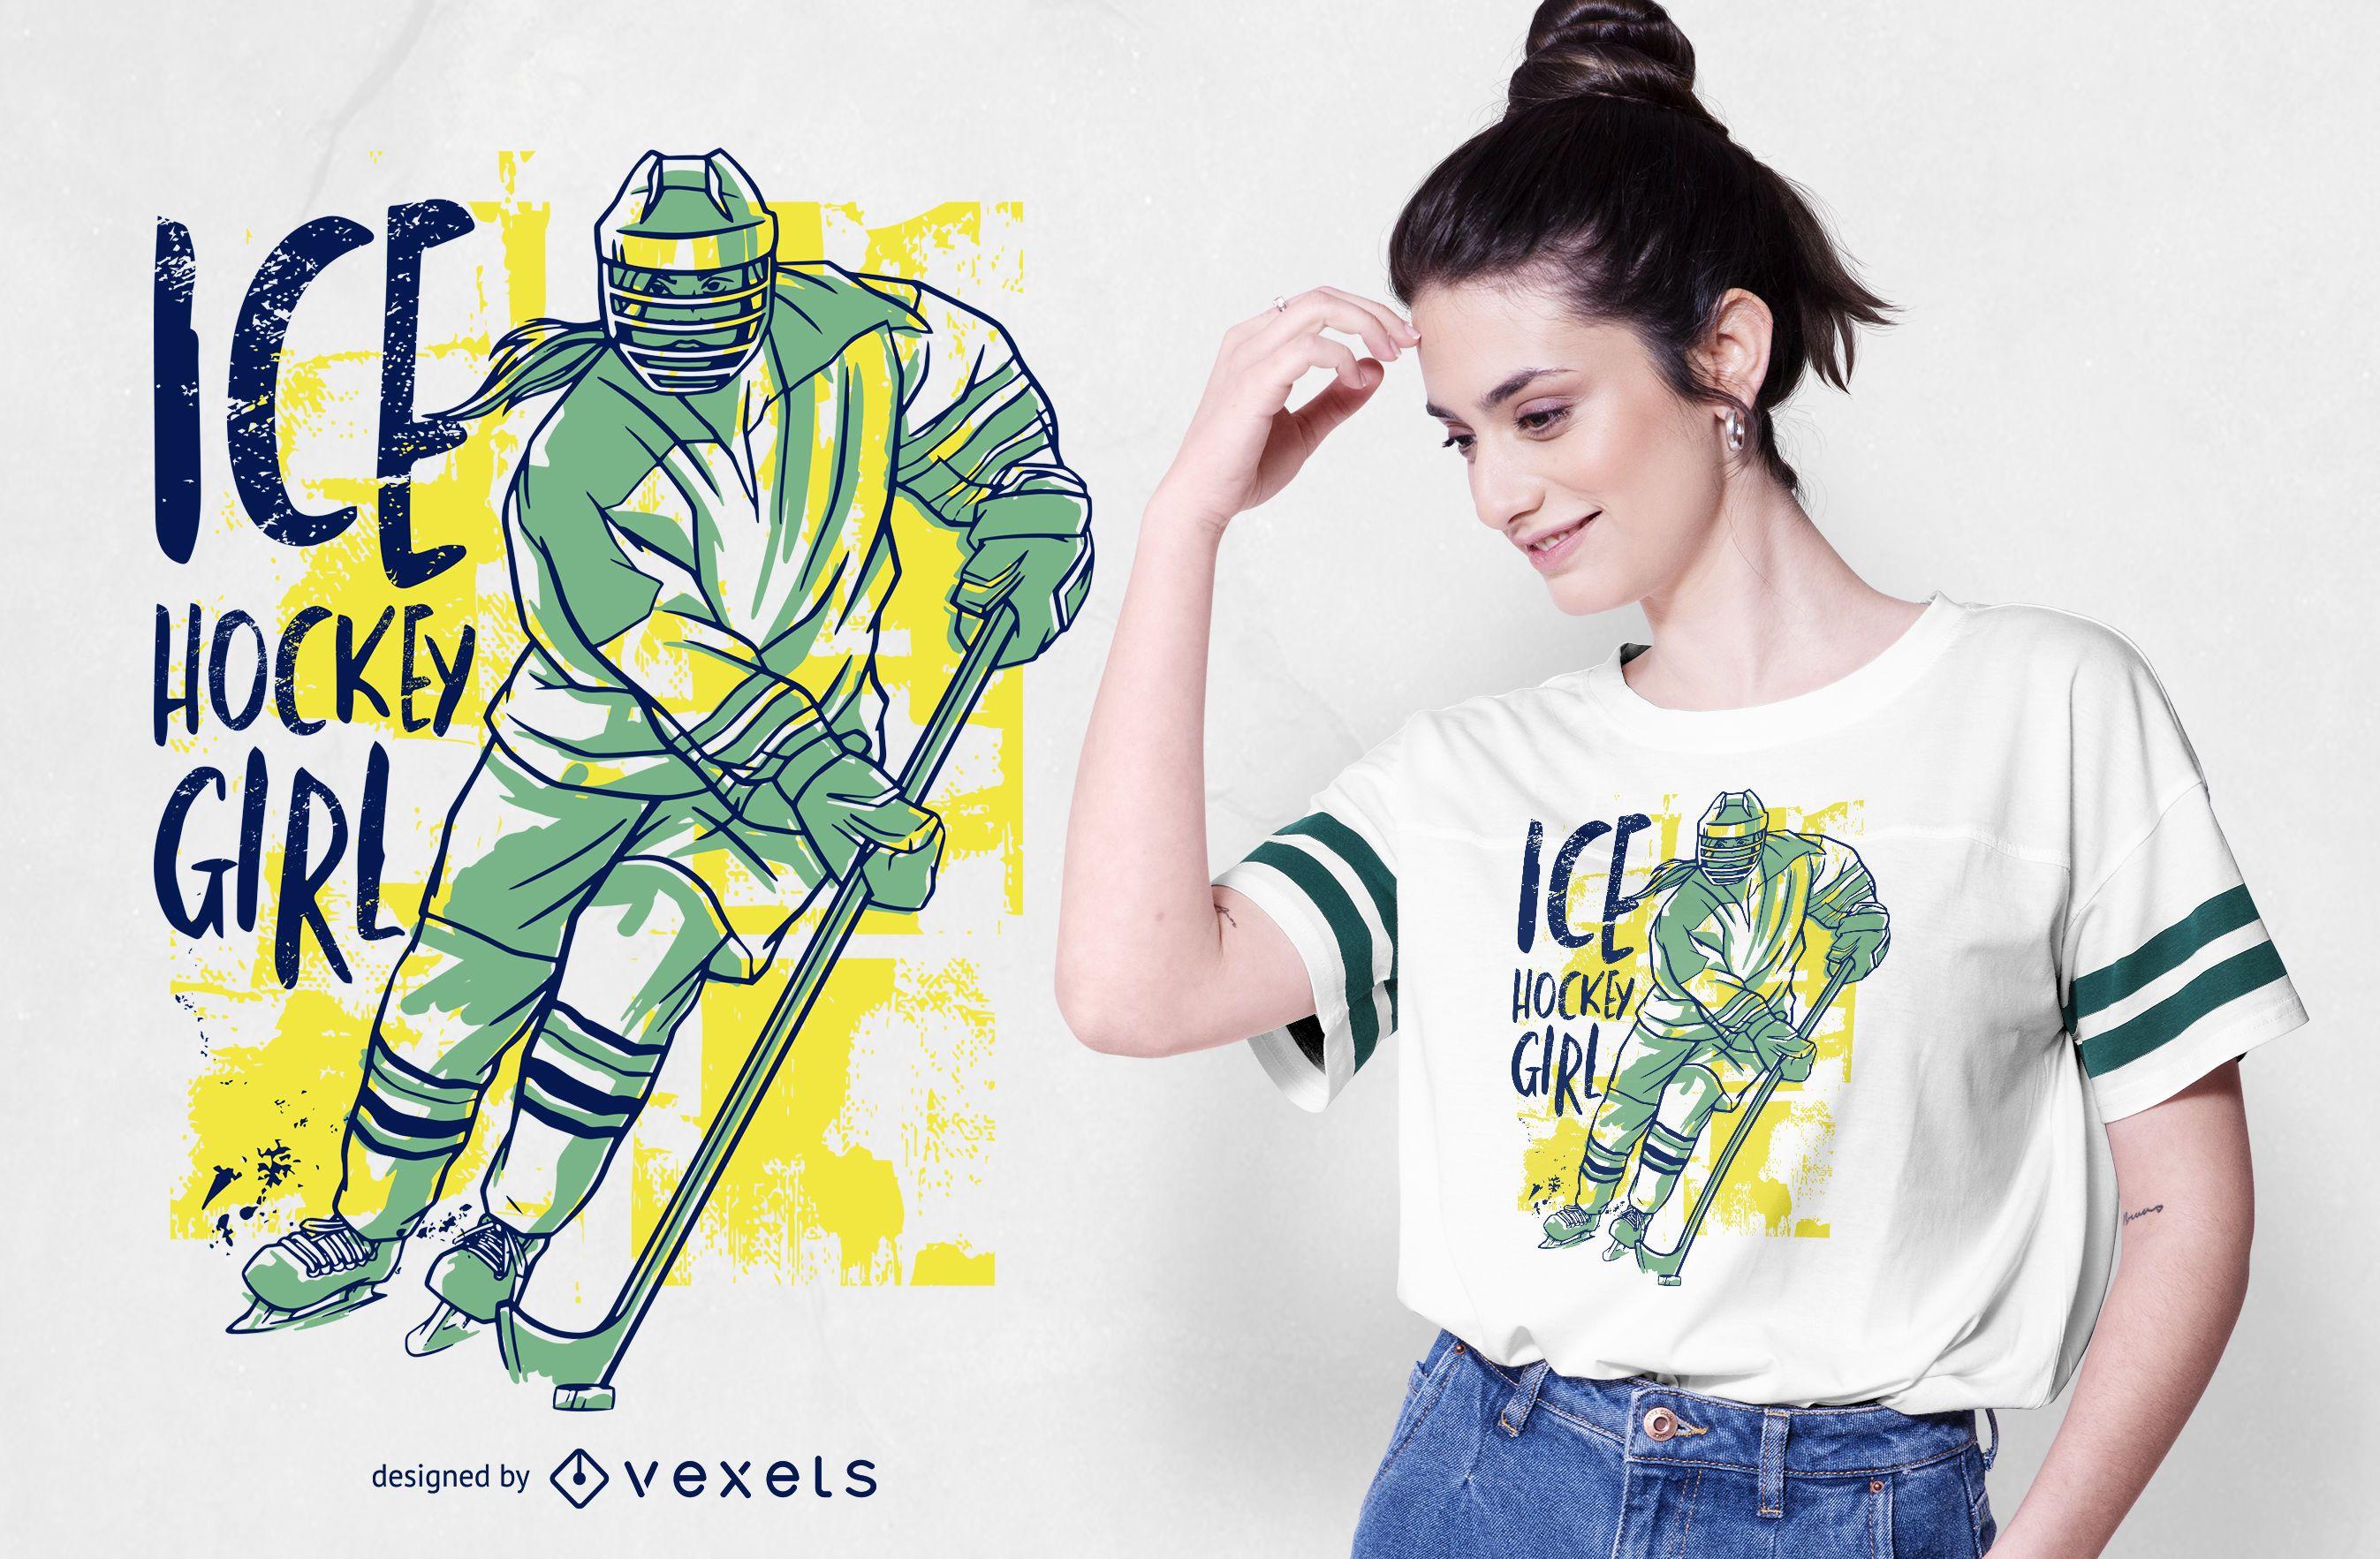 Ice hockey girl t-shirt design